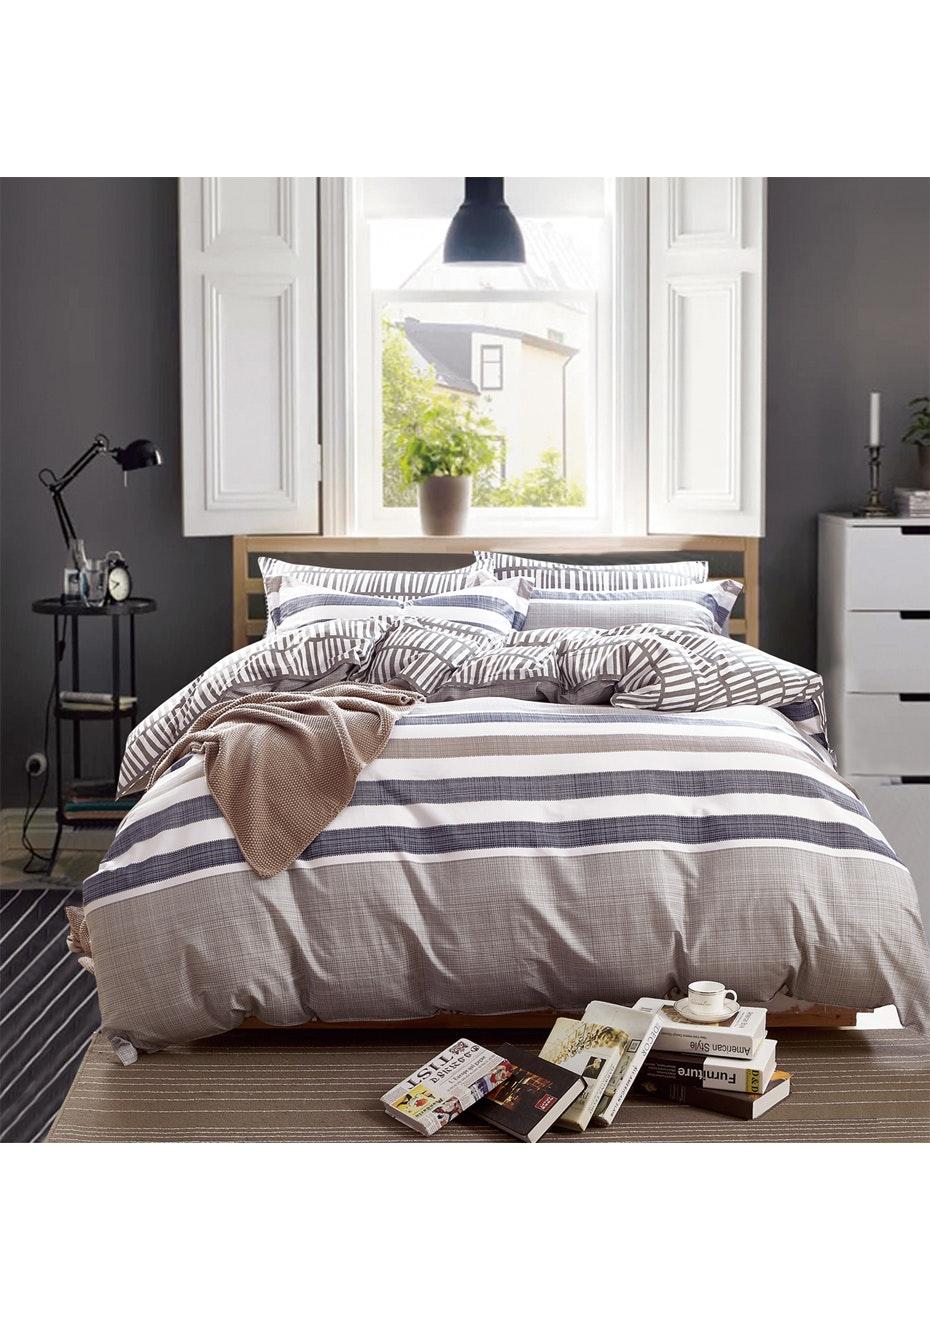 Ballina Quilt Cover Set - Reversible Design - 100% Cotton - King Bed